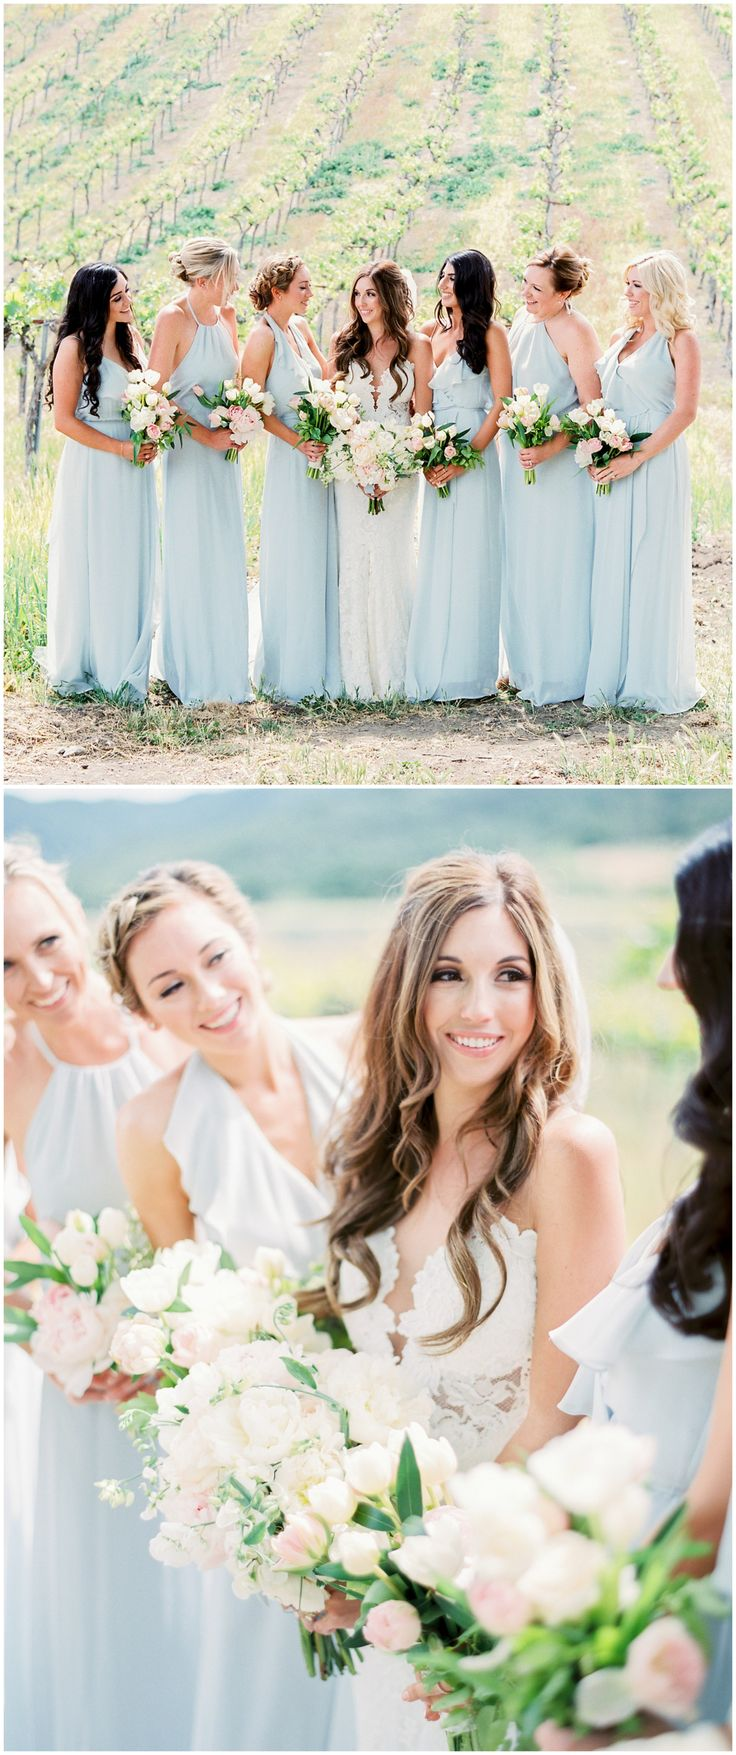 Pastel blue bridal party, white floral wedding bouquets, long bridesmaid dresses, California vineyard wedding // Rachel Solomon